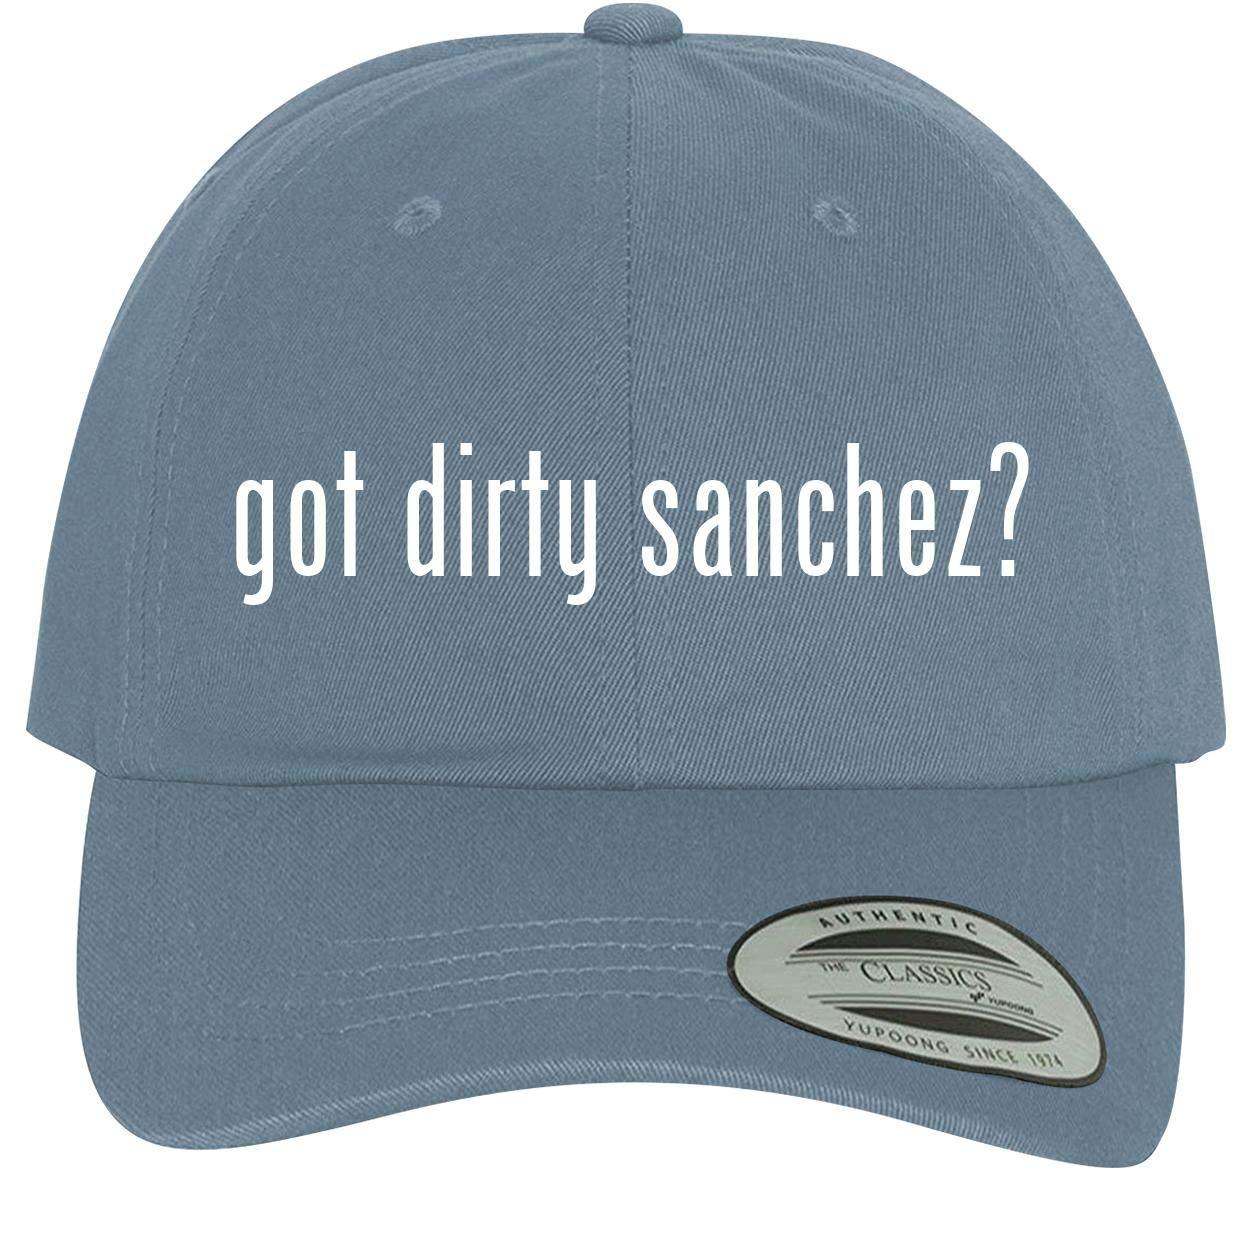 BH Cool Designs got Dirty Sanchez? Comfortable Dad Hat Baseball Cap